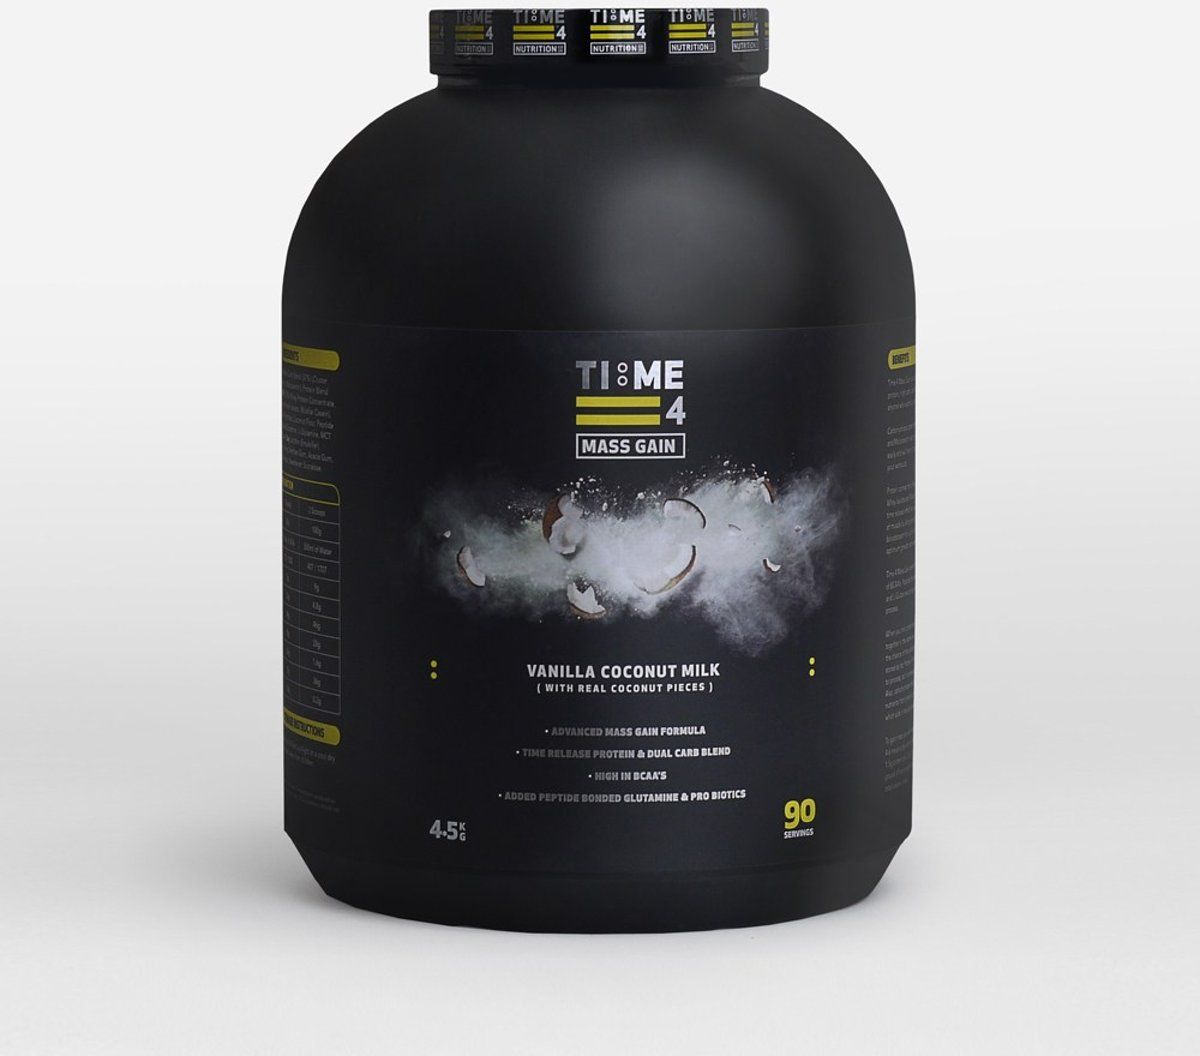 Time 4 Nutrition Koolhydraten Mass Gain Shake Vanille Coconut Milk 4.5 Kg kopen